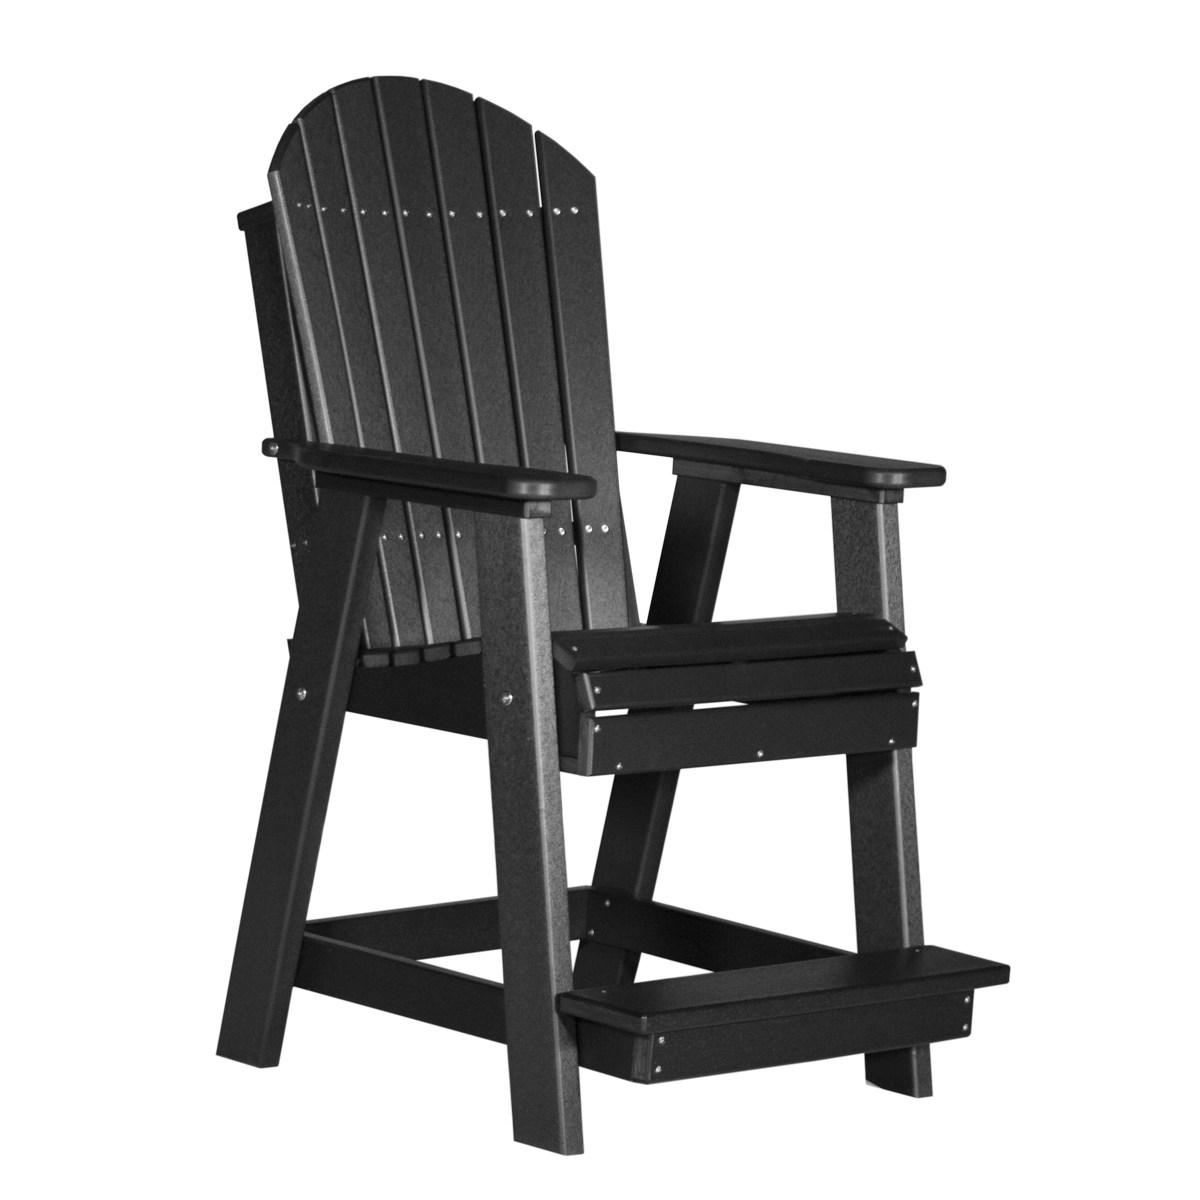 Adirondack Balcony Chair Recycled Patio Fine Oak Things